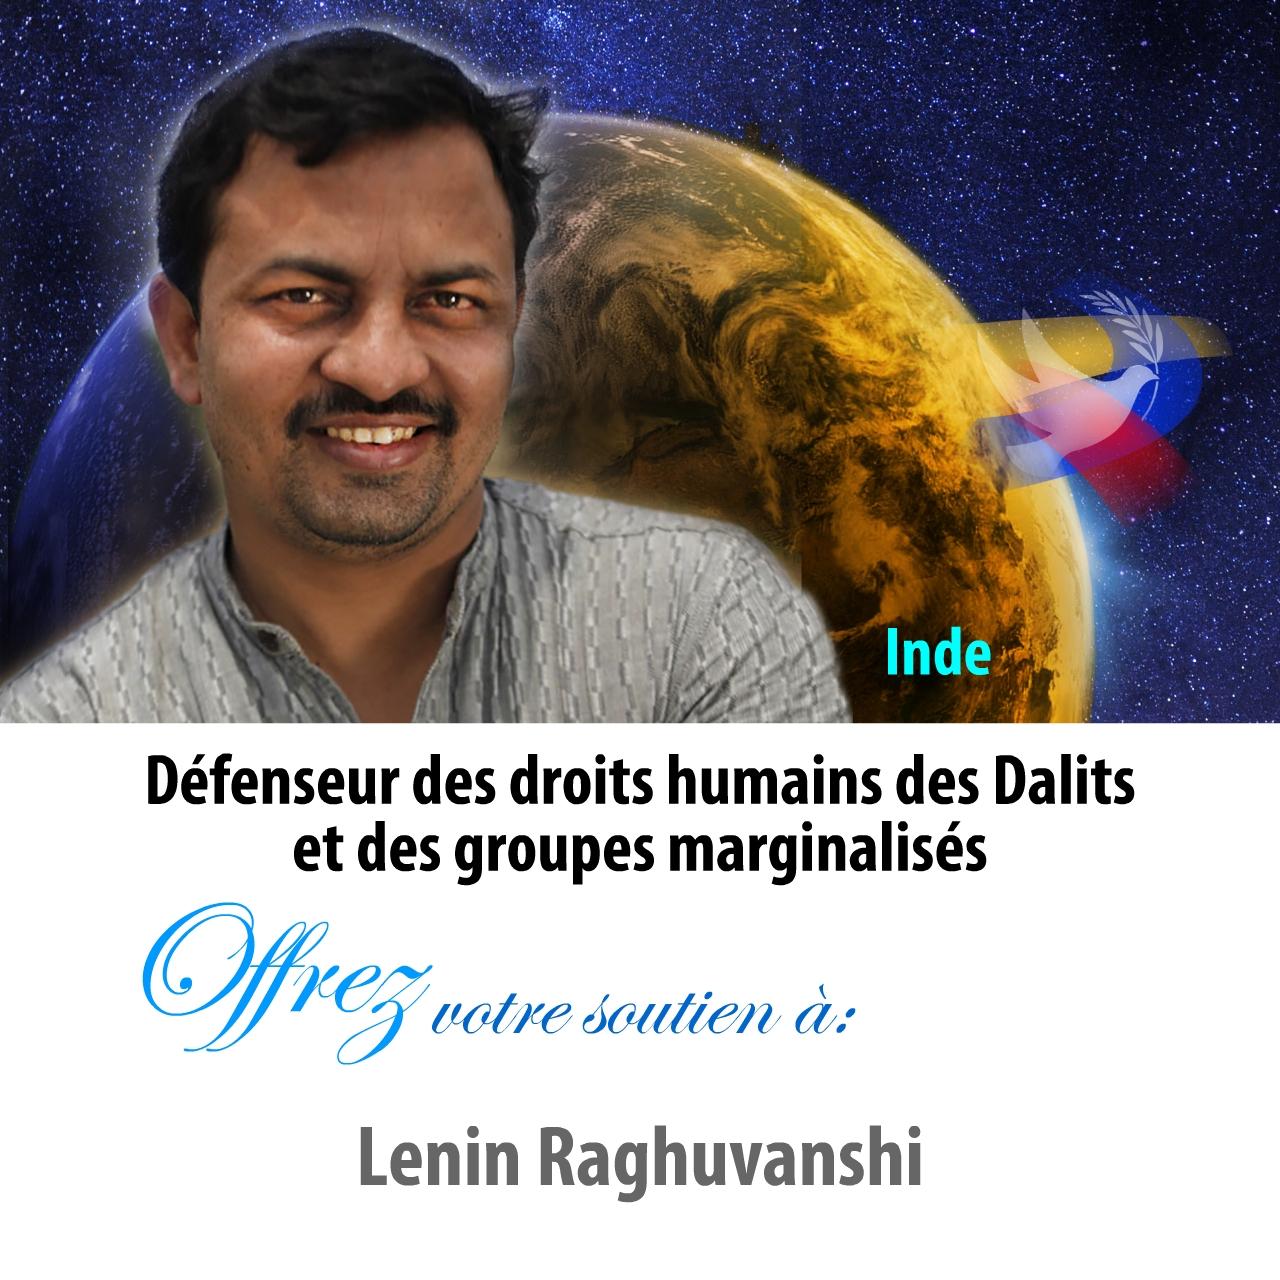 Lenin-photo profil-fr